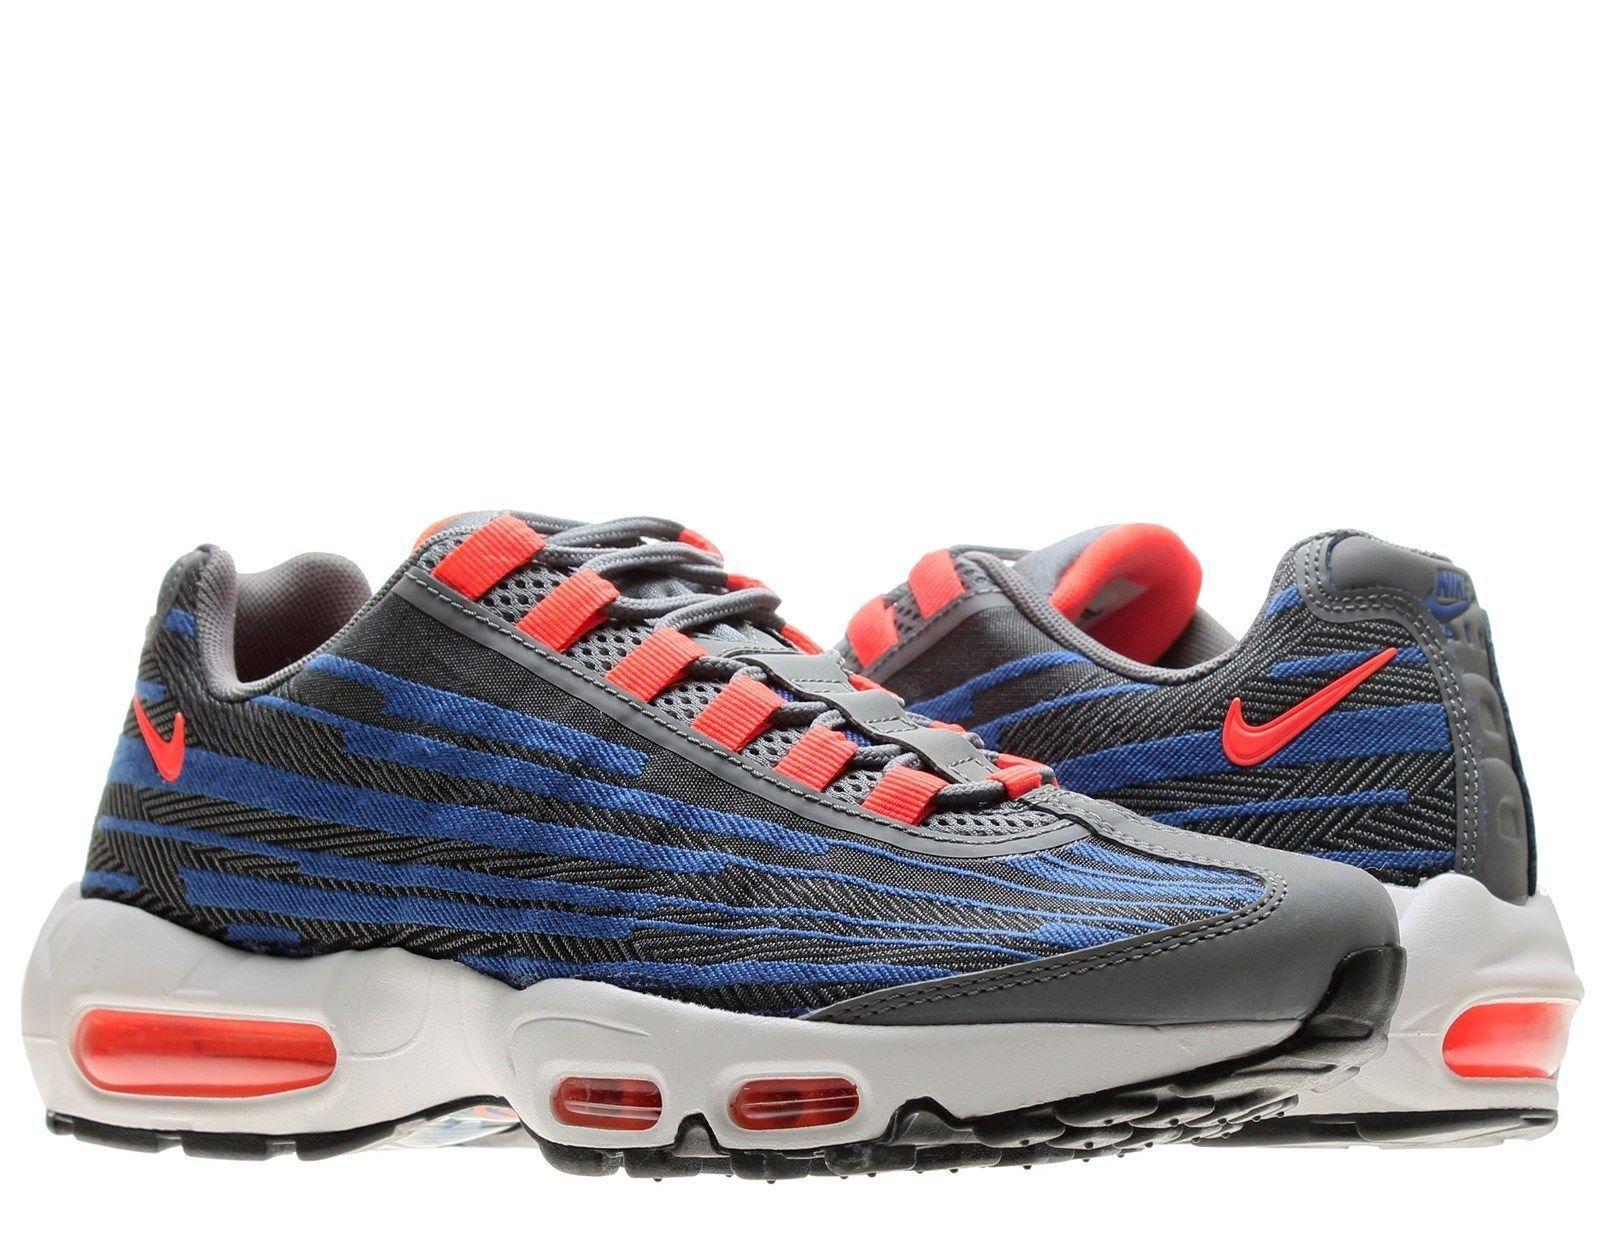 NIB Men's Nike Air MAX 95 JCRD Pack Retro Shoes Sneakers 644793-004 Cheap women's shoes women's shoes